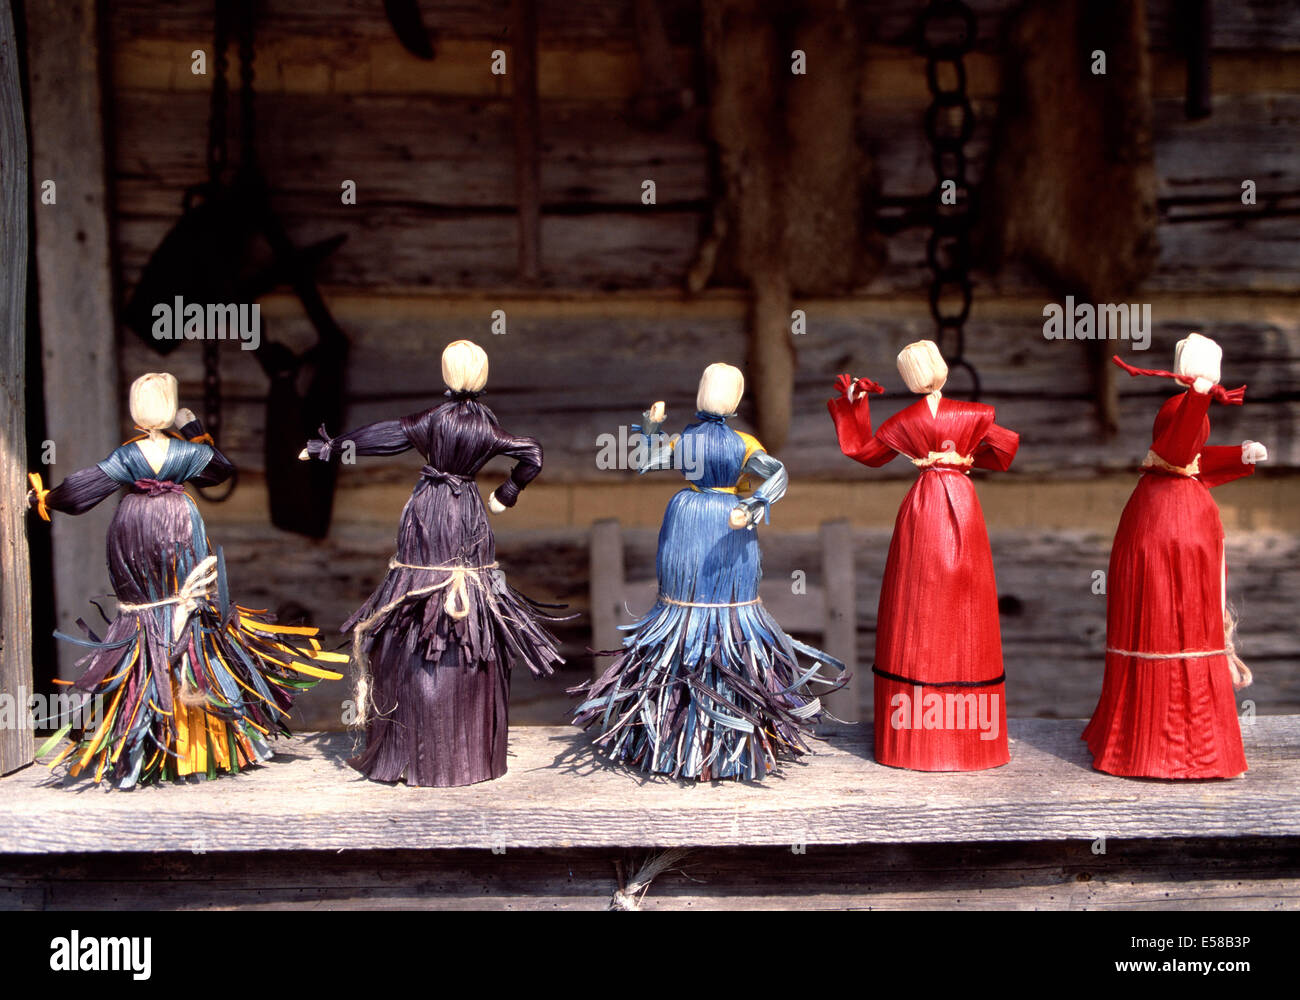 Corn husk dolls,Museum of Appalachia,Norris,Tennessee - Stock Image